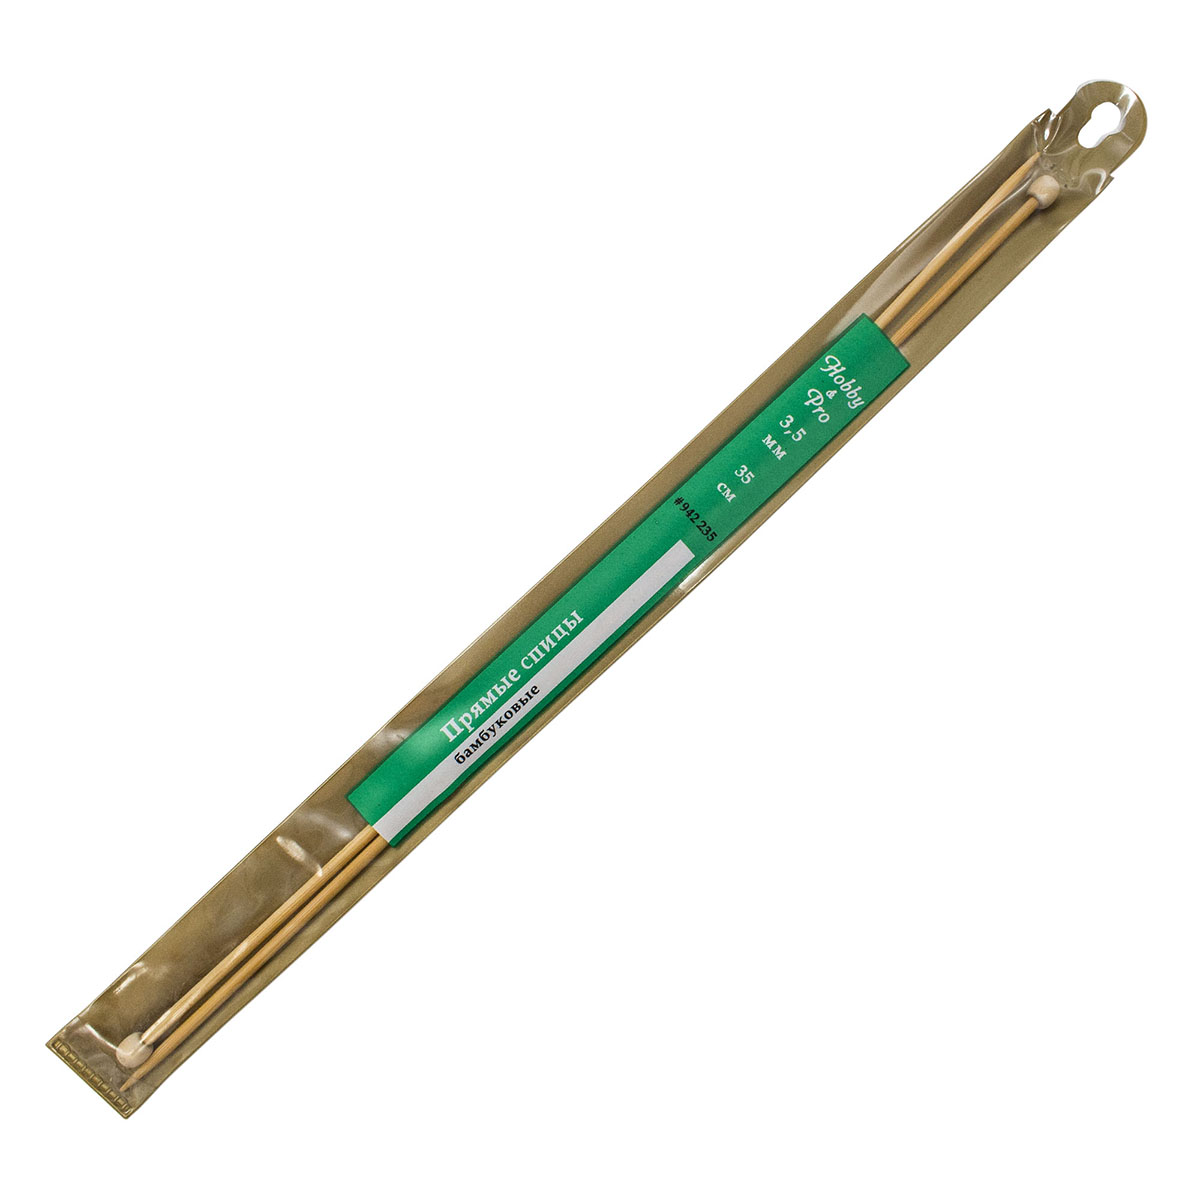 942235 Спицы прямые бамбук 35см, 3,5мм Hobby&Pro